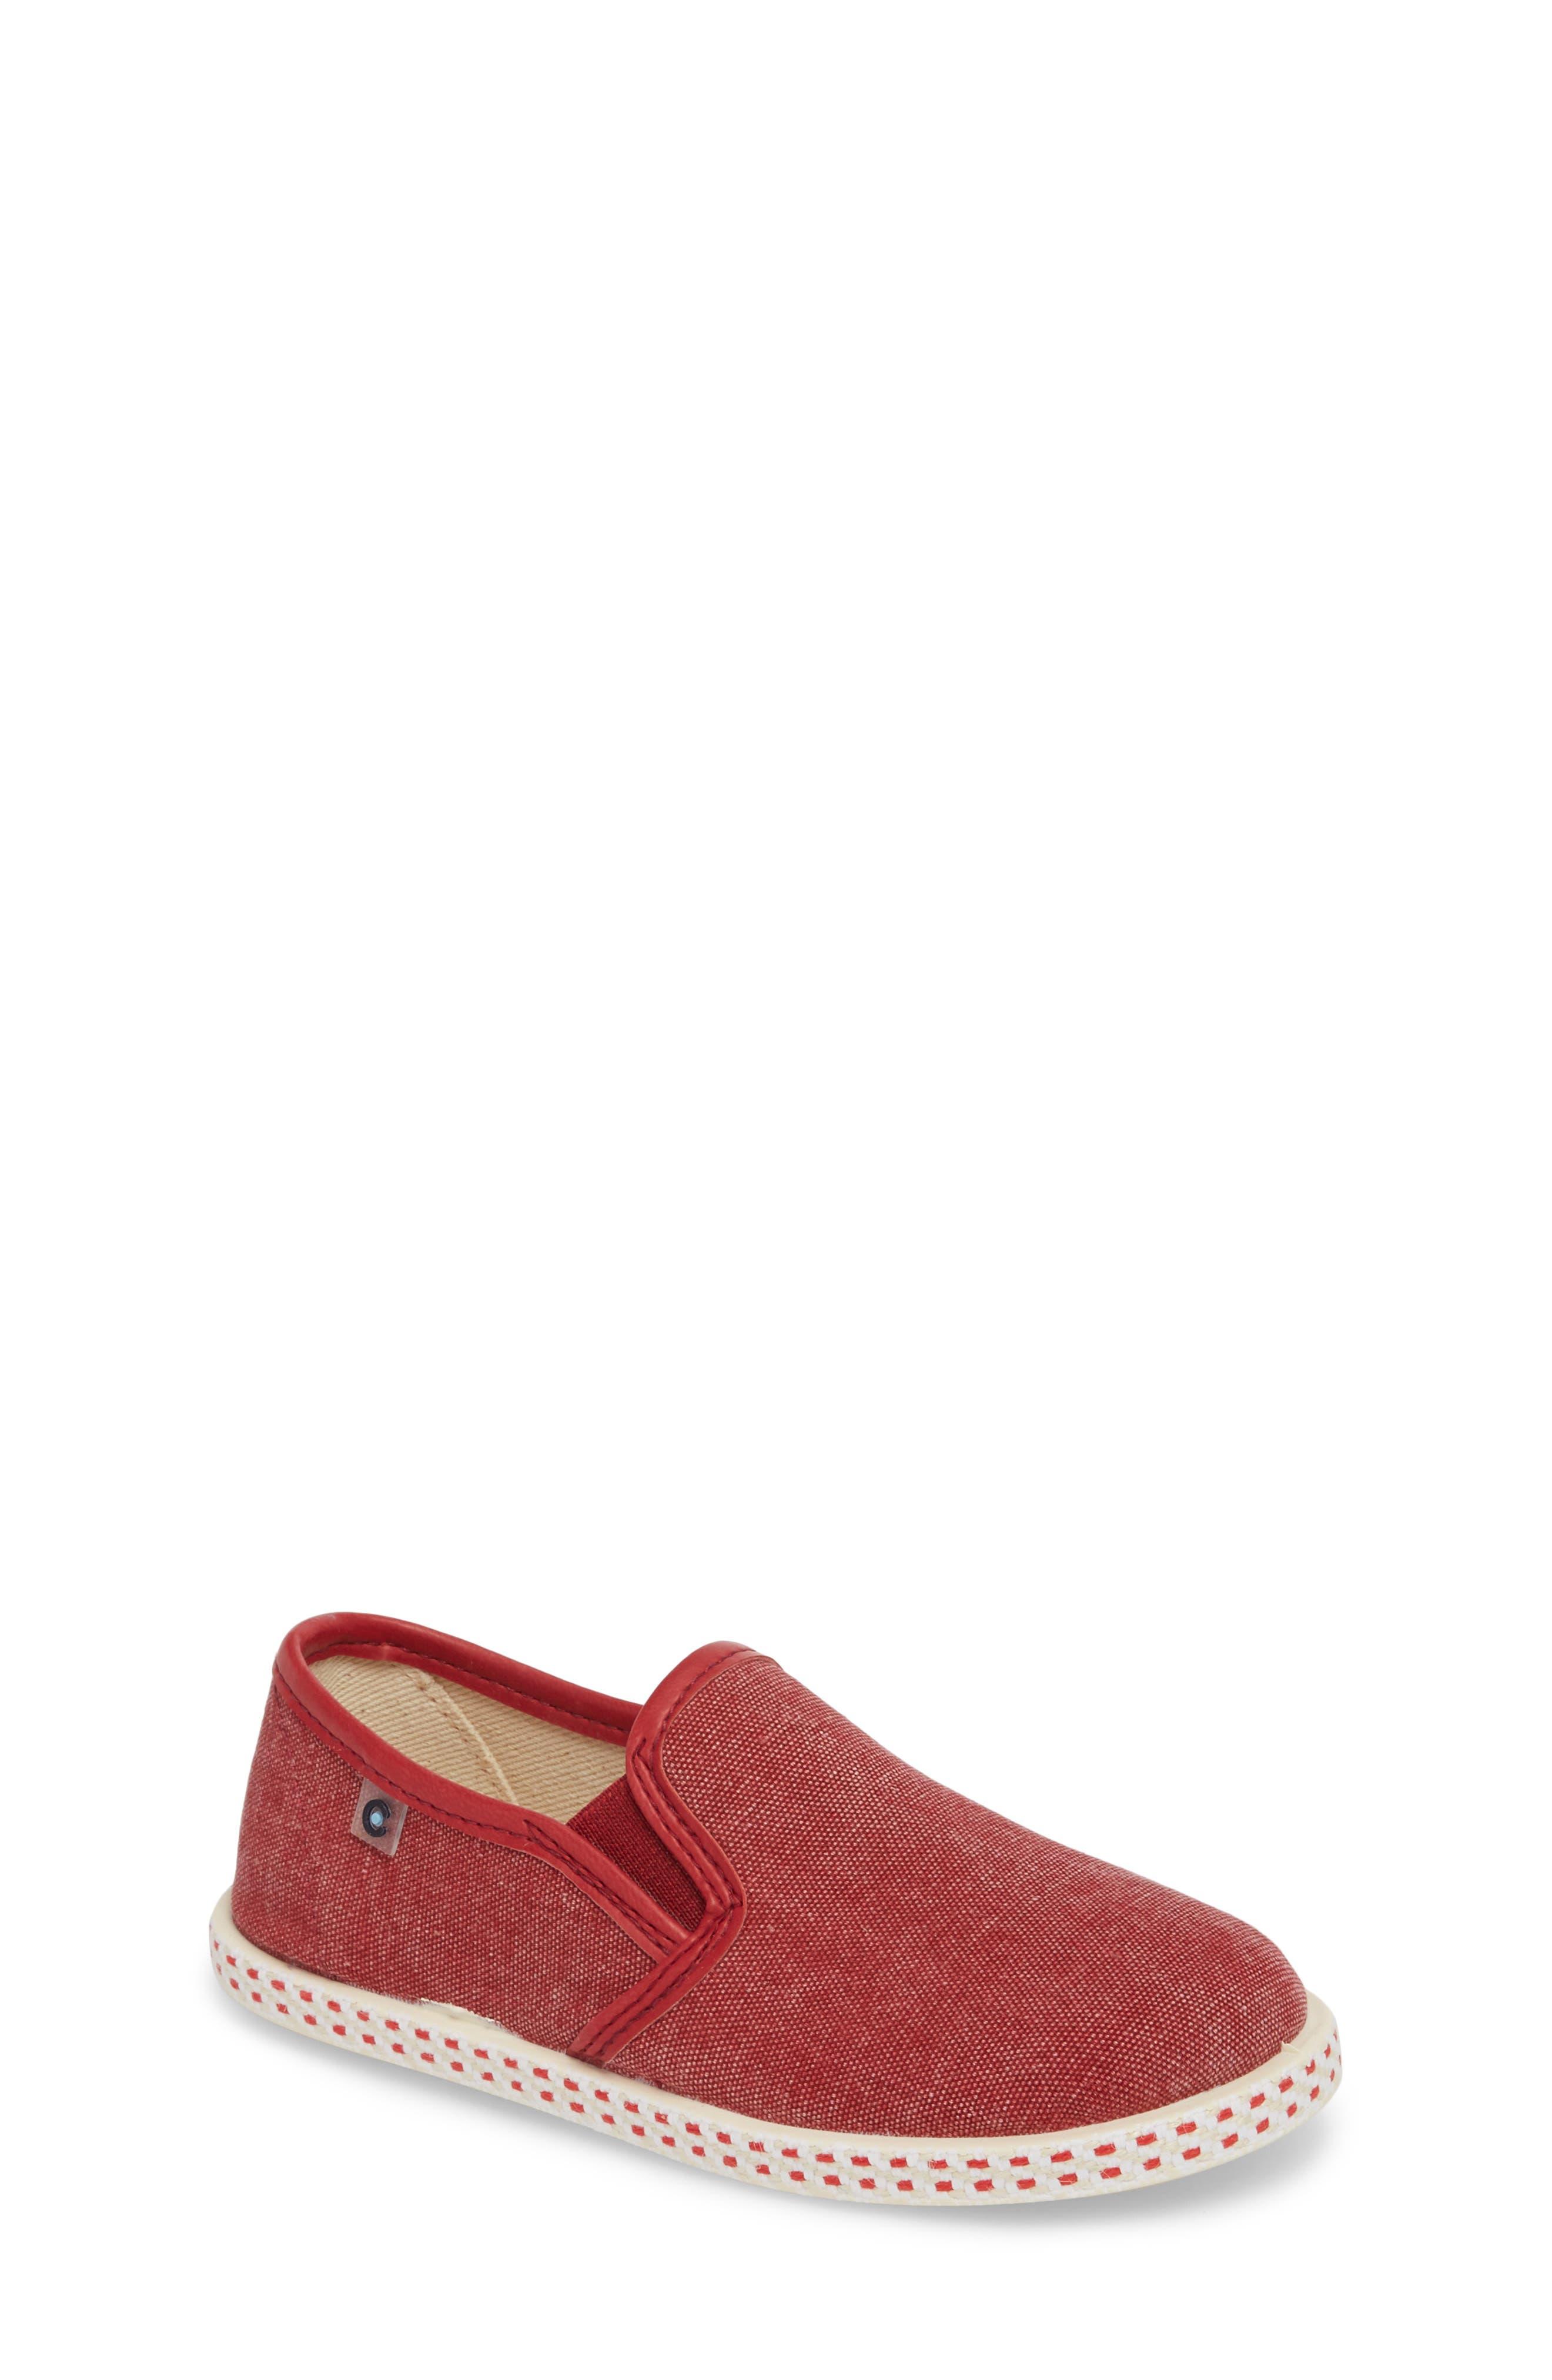 Conguitos Lona Slip-On Sneaker (Toddler & Little Kid)